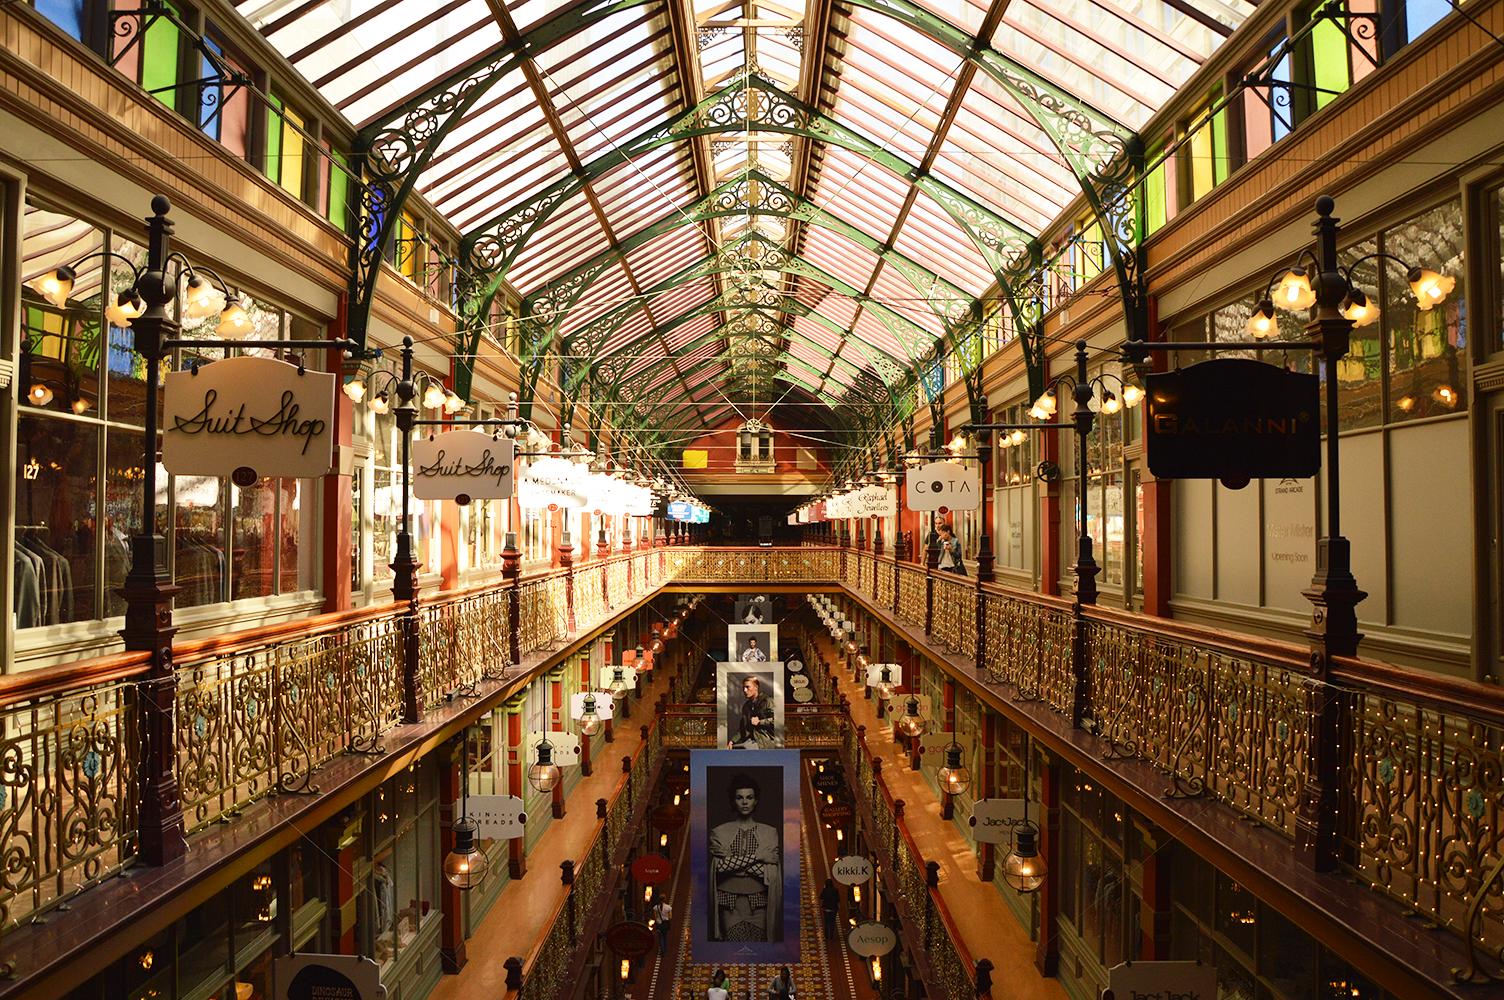 The Strand, Sydney, Australia. Vintage interior